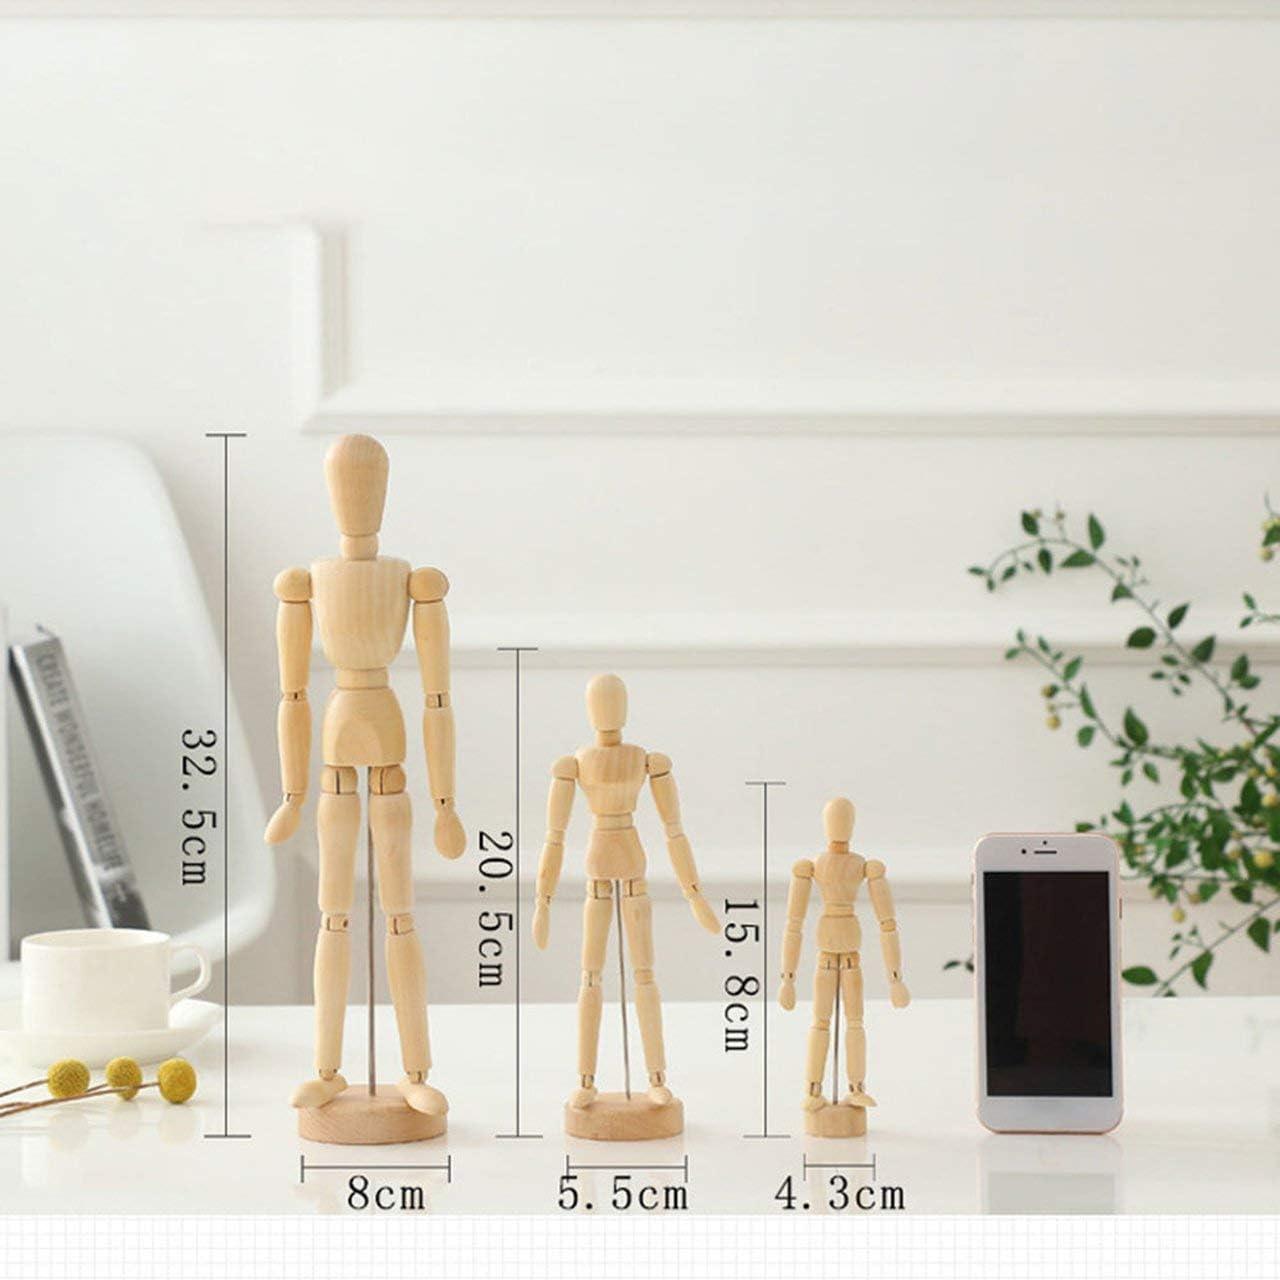 Ba30DEllylelly Arte humano de madera posable Dibujo Articulaciones flexibles Maniqu/í Maniqu/í Figuras Mu/ñeca Modelo Bosquejo Maniqu/í Mano